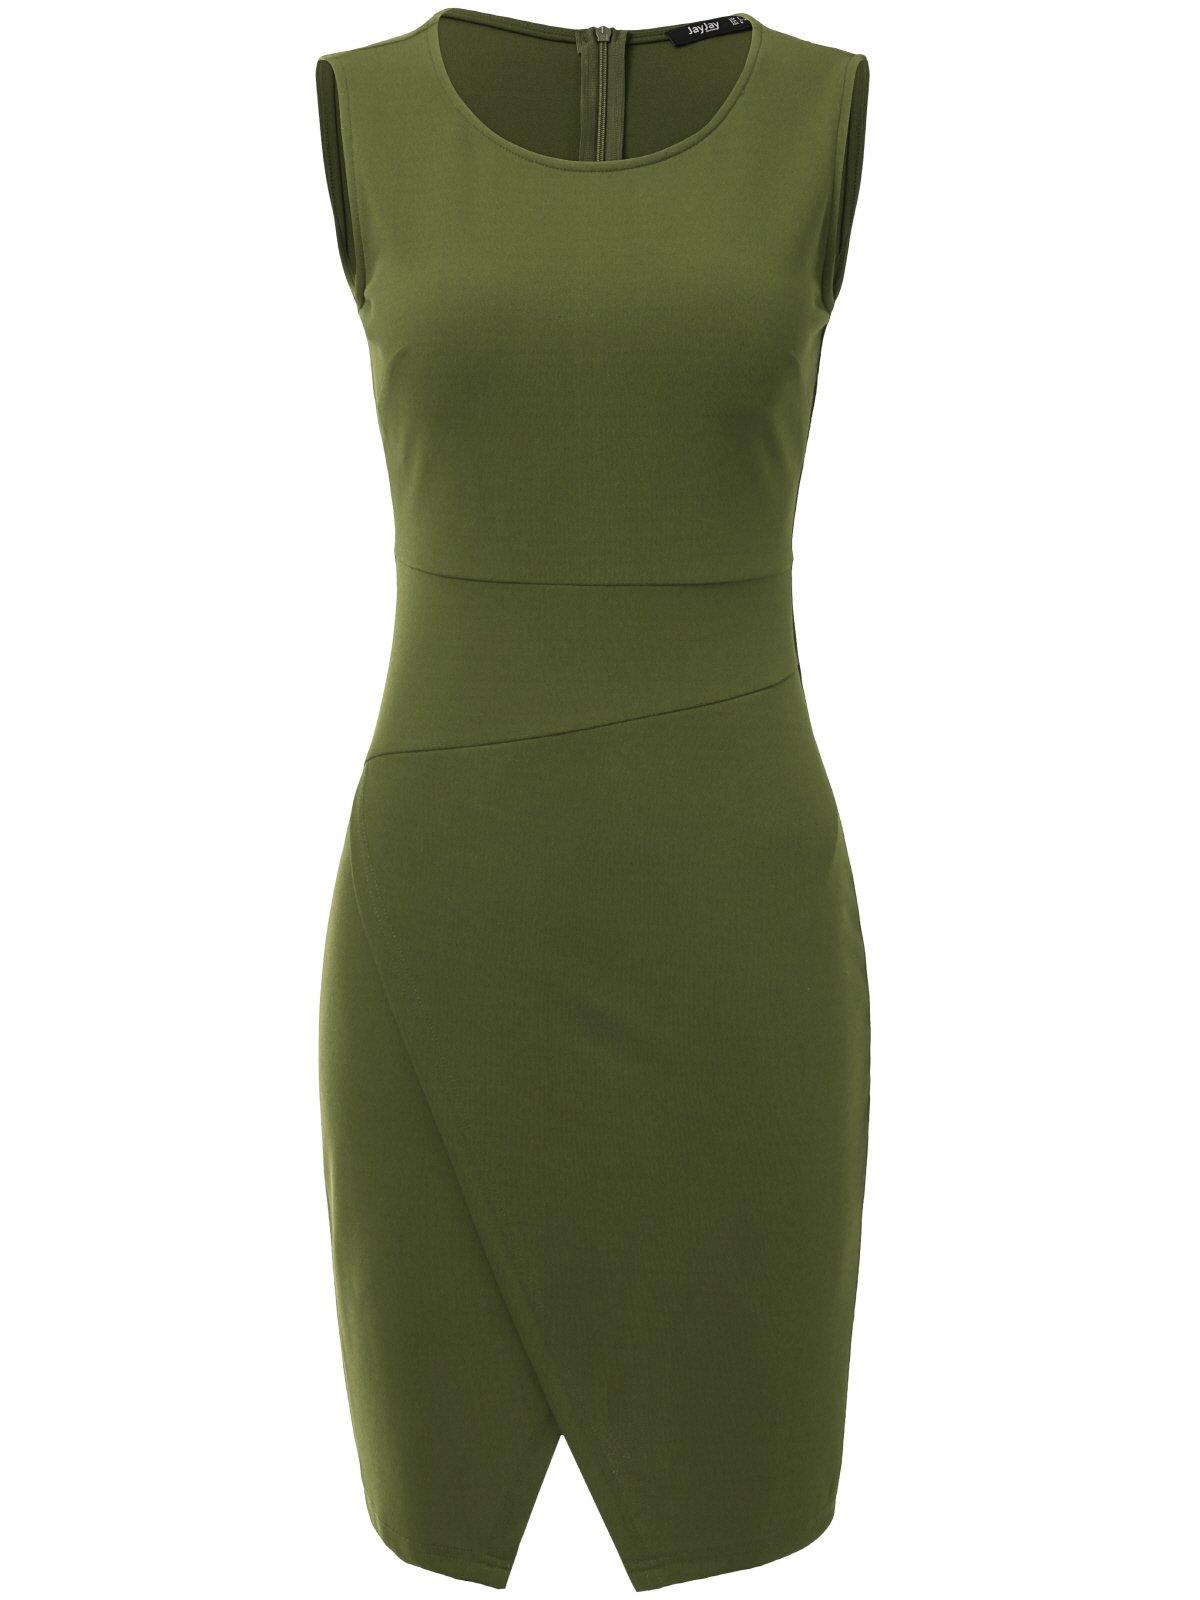 JayJay Women Wear to Work Business Sleeveless Slim Cocktail Pencil Wrap Skirt Dress,ArmyGreen,S